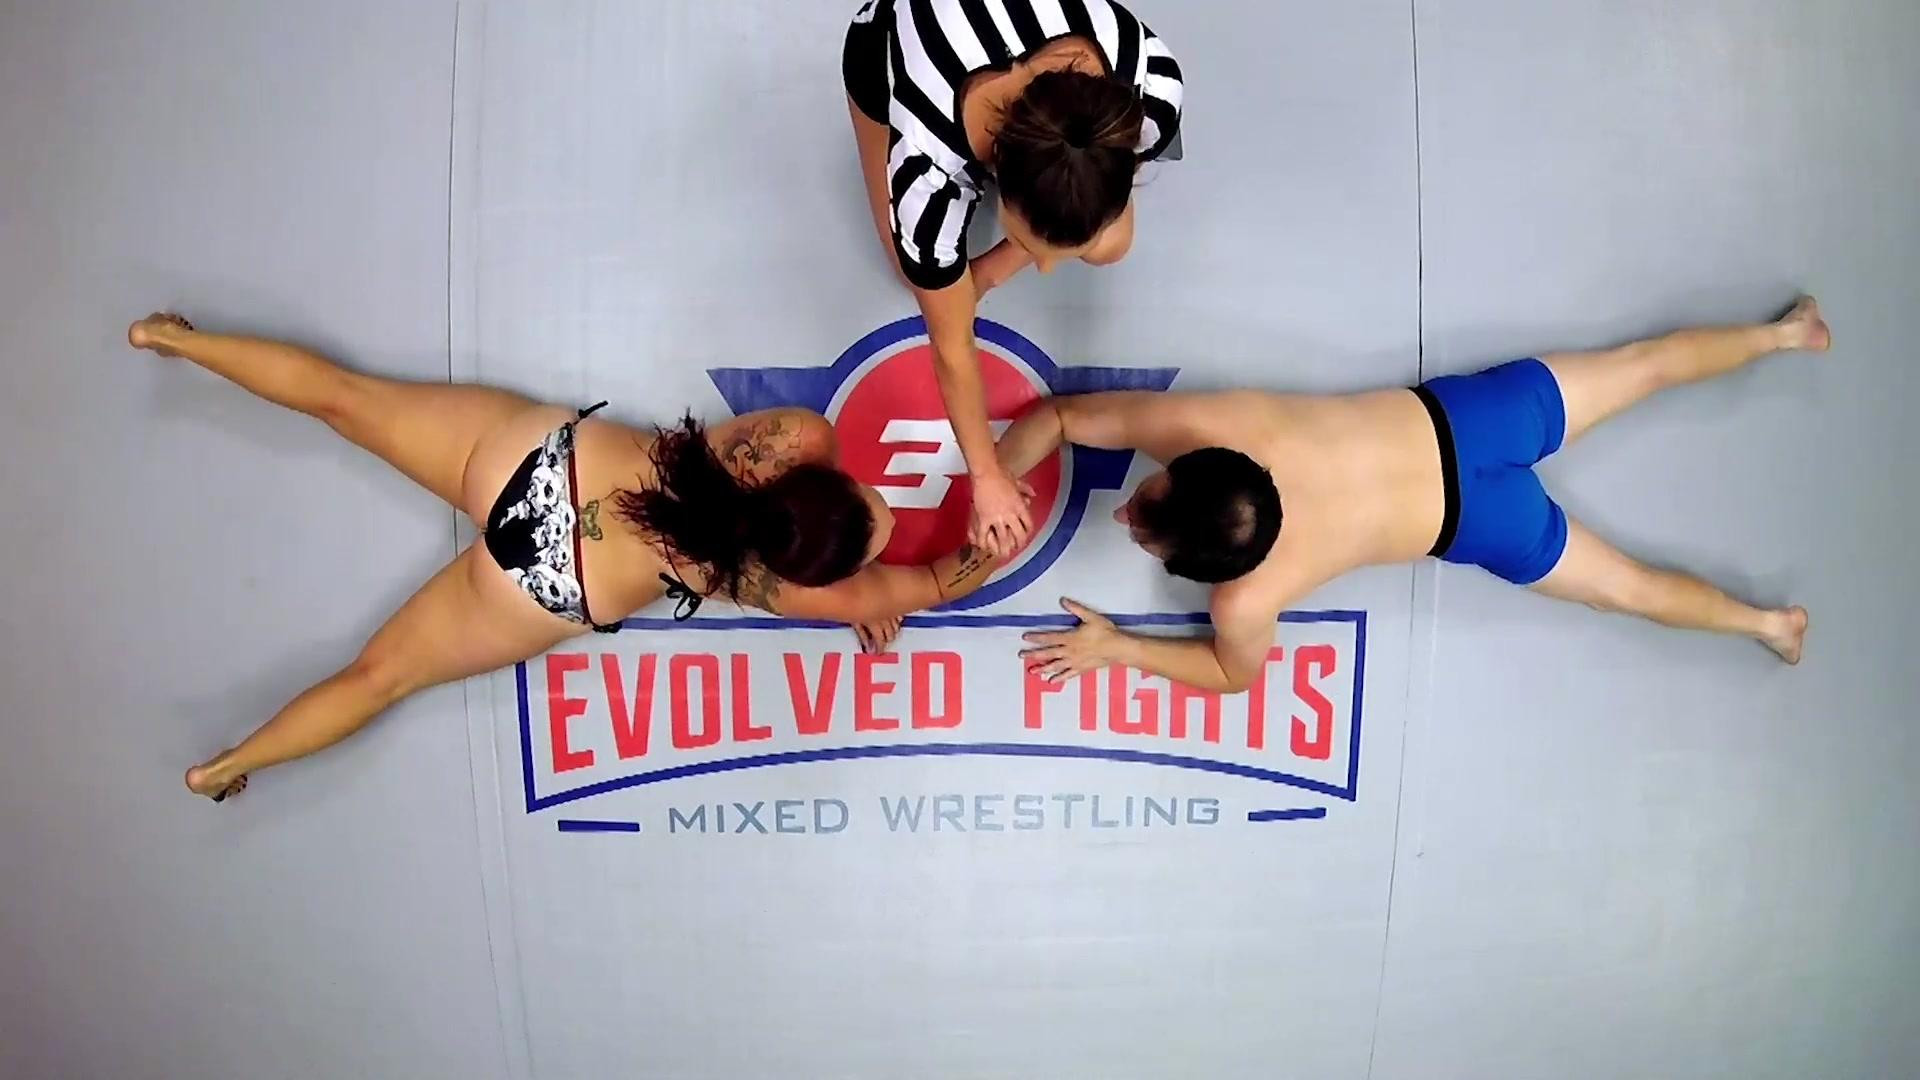 EvolvedFights 20 09 17 Bella Rossi Vs Marcelo Arm Wrestling XXX 1080p MP4-FETiSH